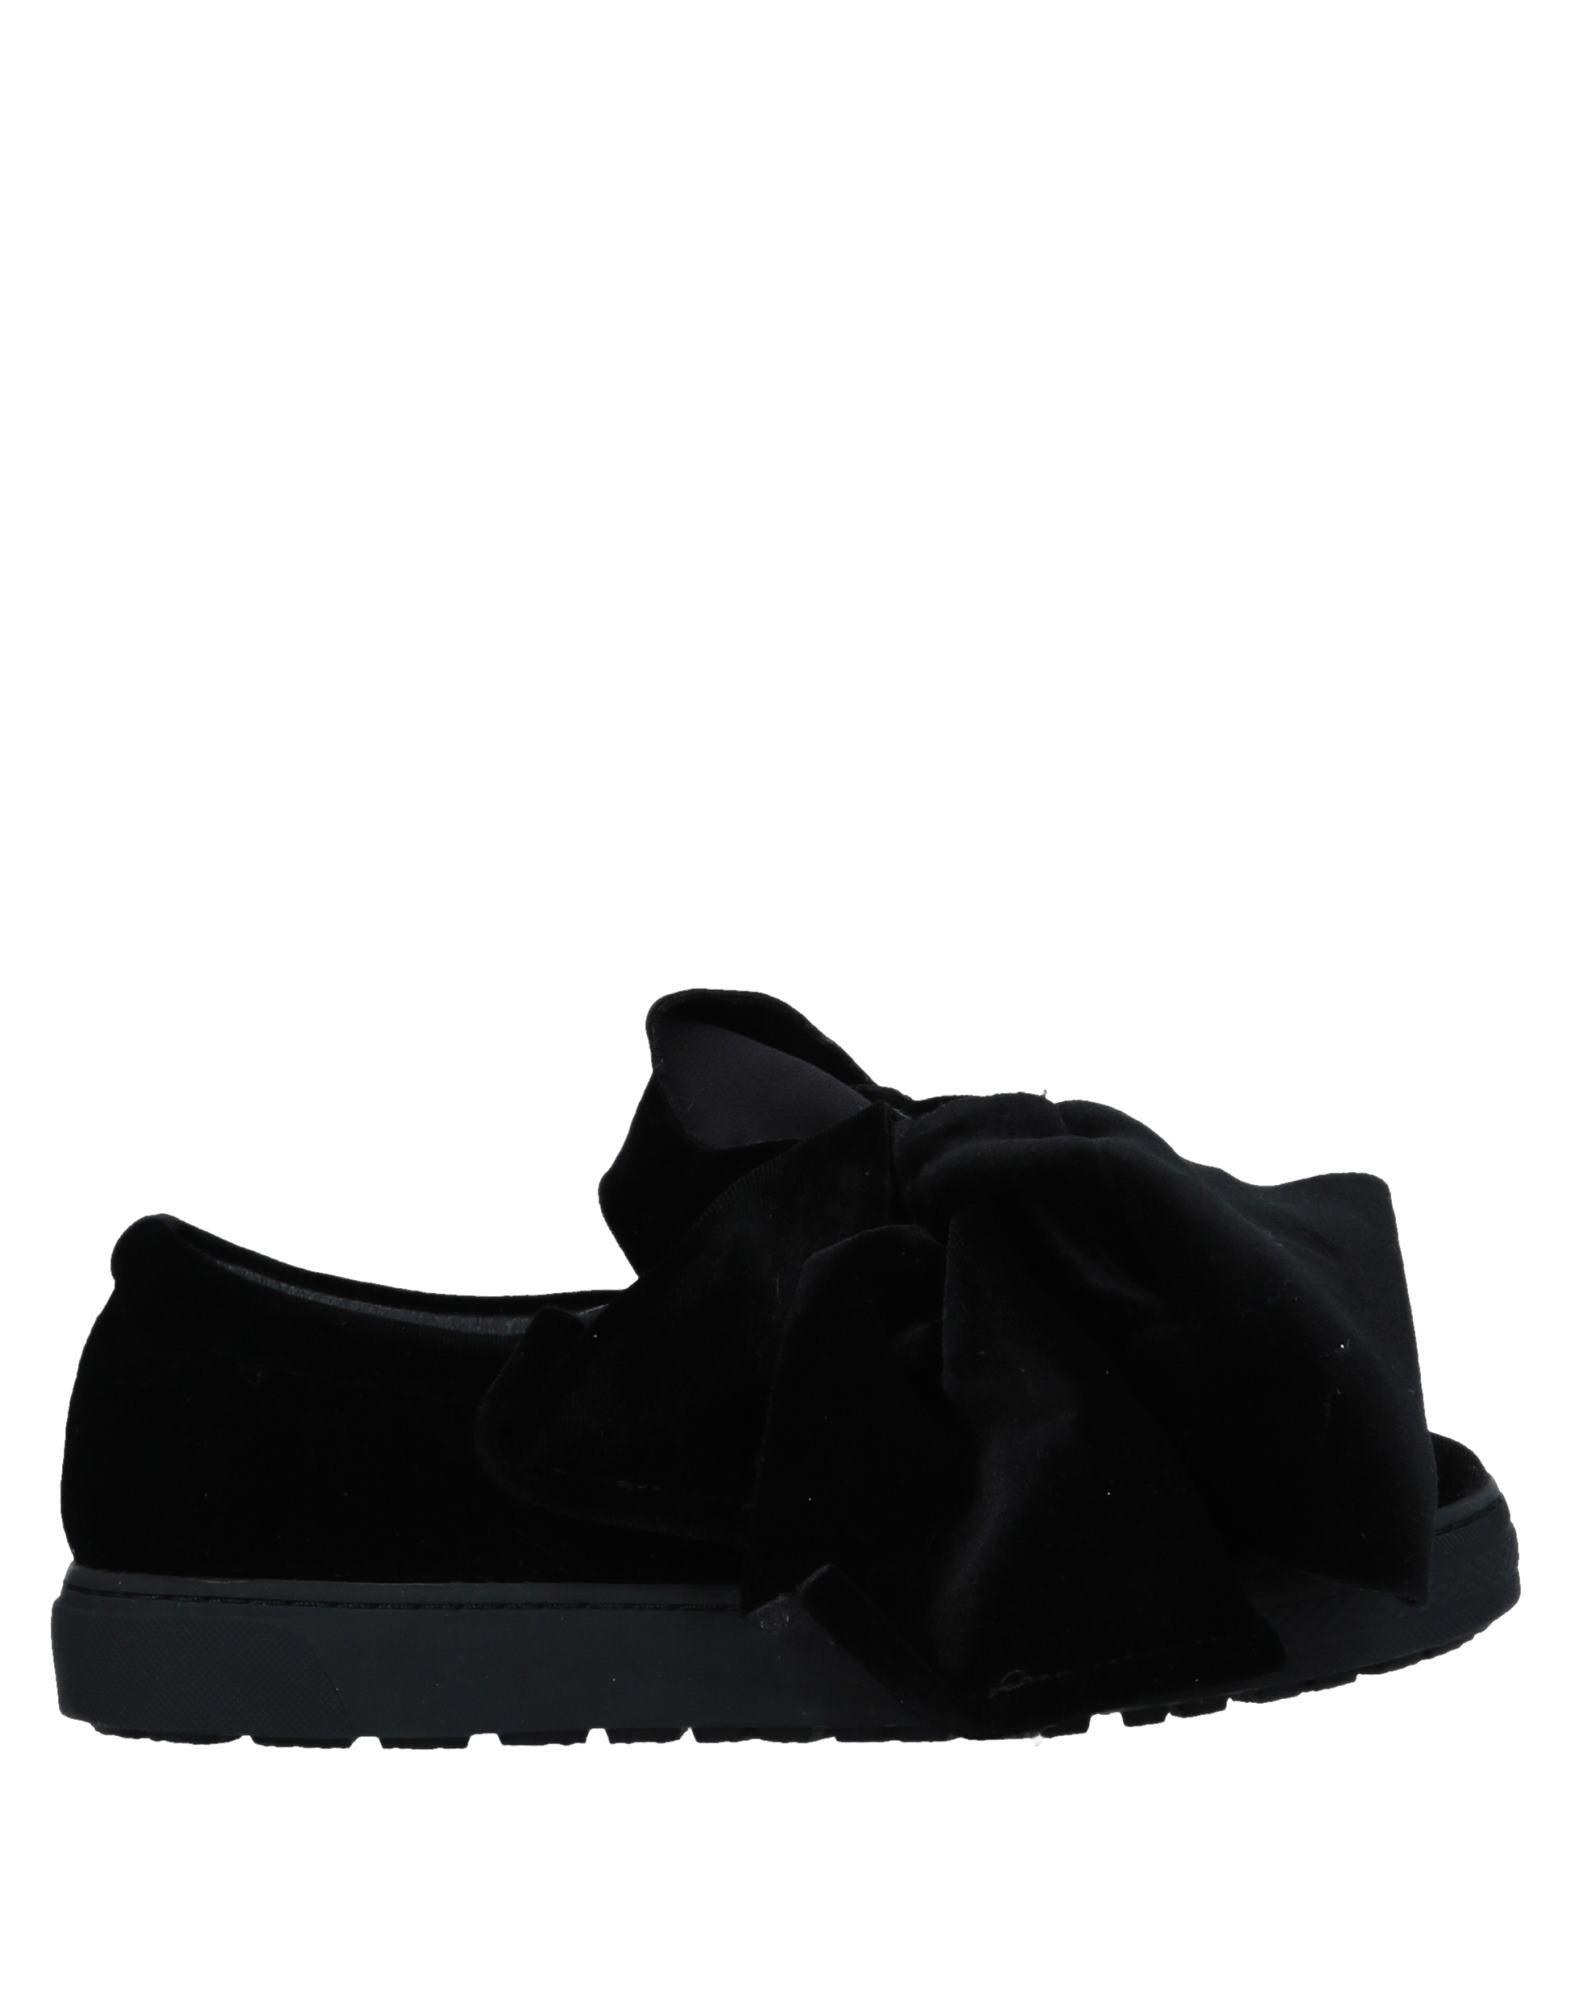 Roberto Della Croce Sneakers Damen  11526476EV Gute Qualität beliebte Schuhe